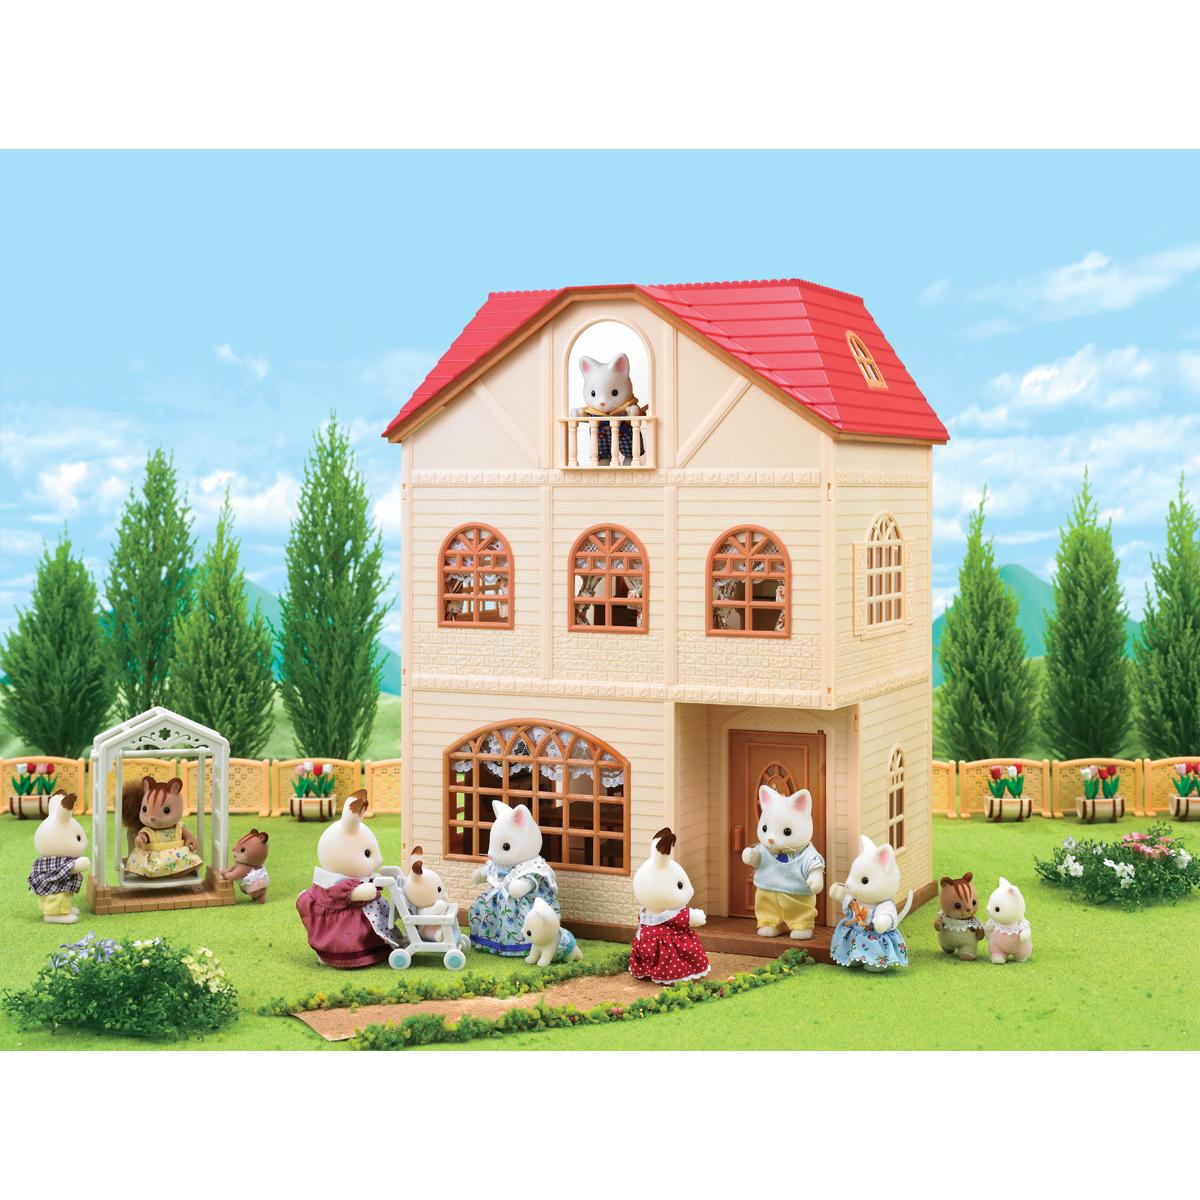 Sylvanian Families 3 Story House £29.99 @ TheToyShop.com (The Entertainer)